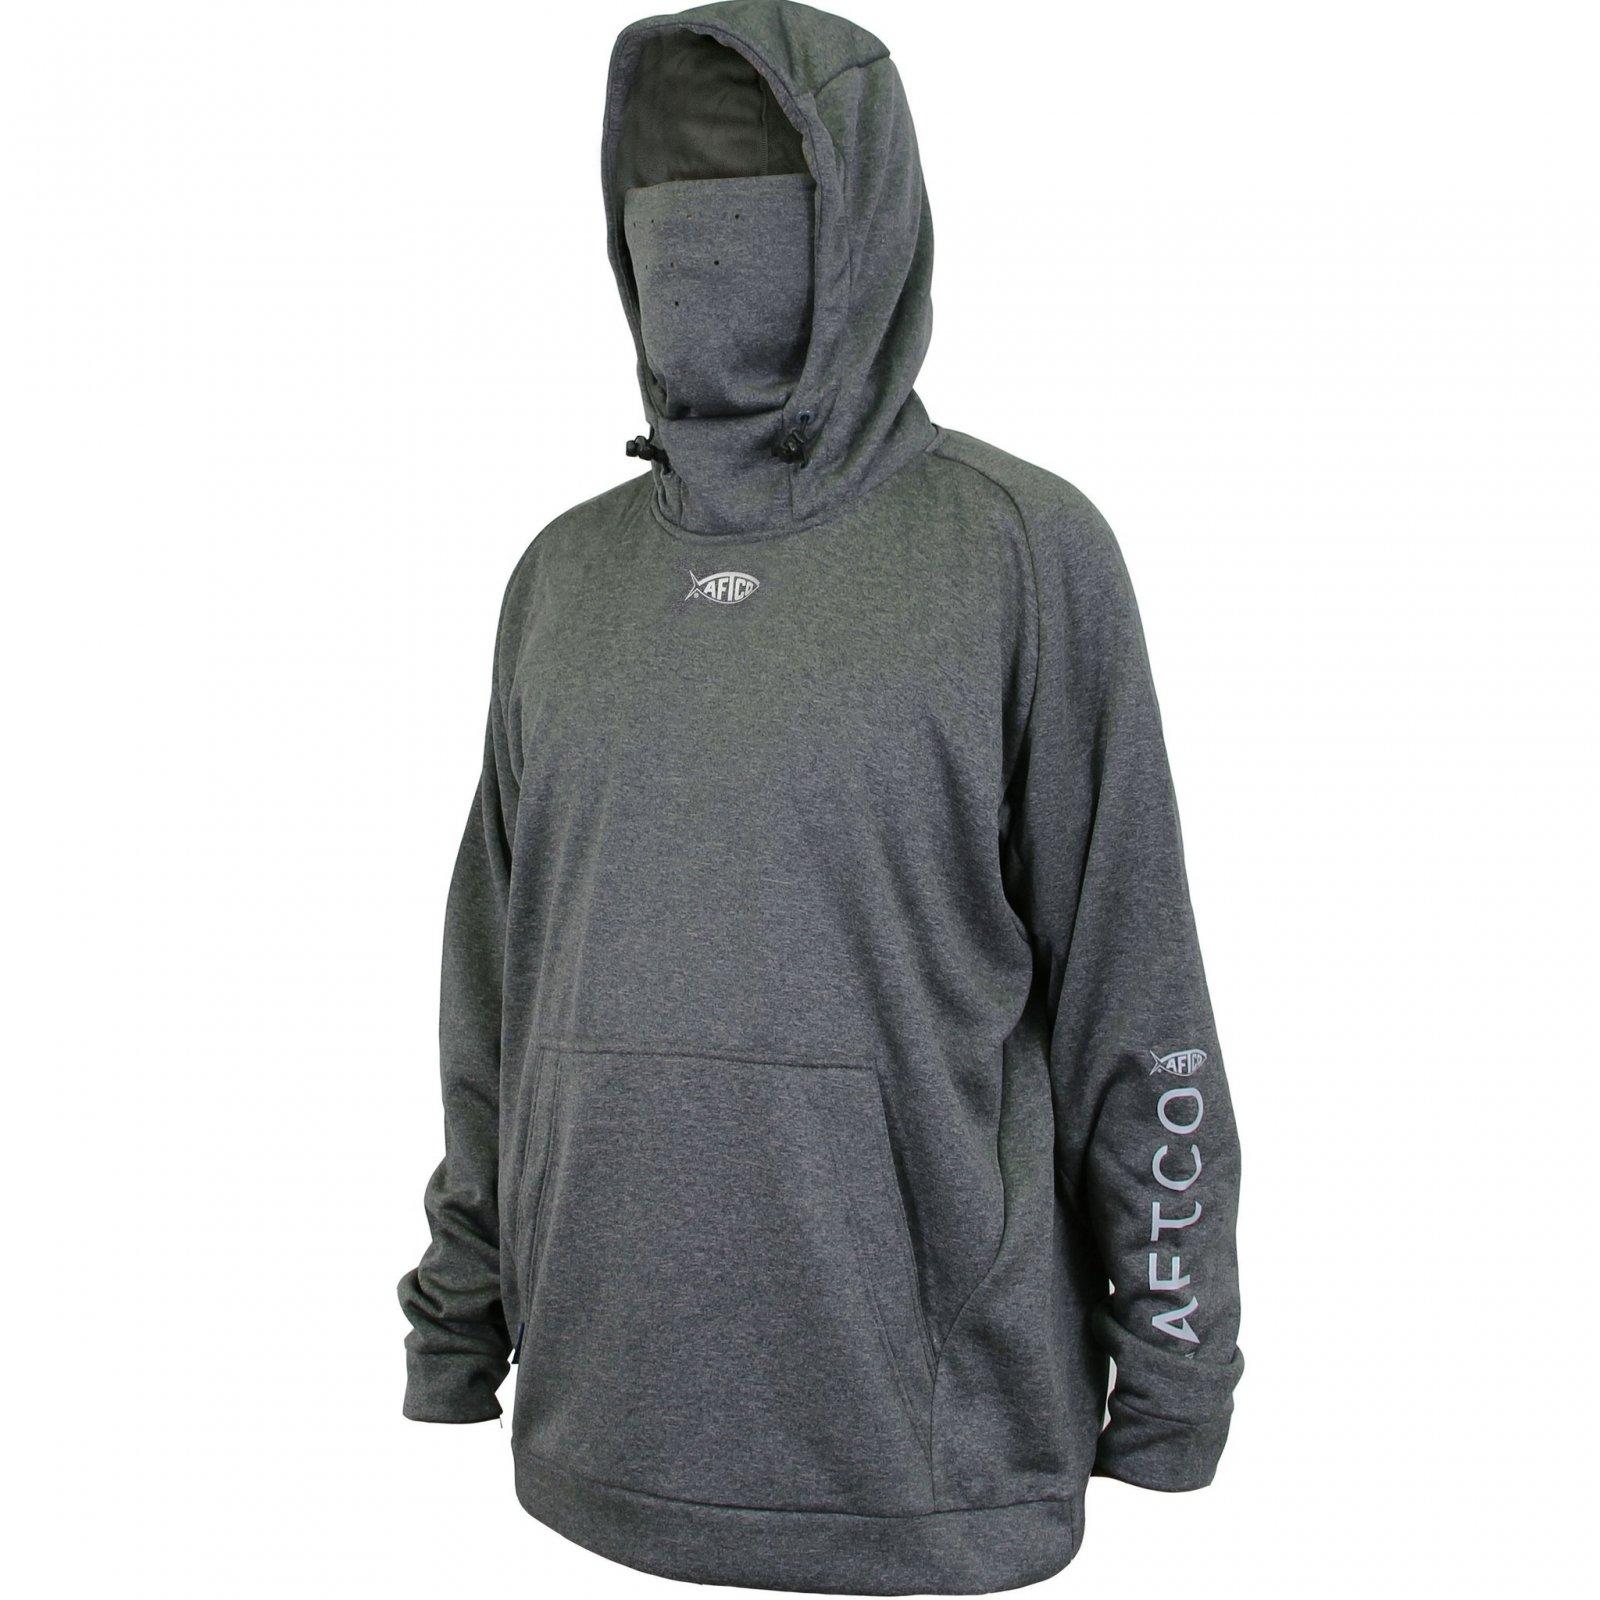 Aftco Reaper Technical Sweatshirt Charcoal Heather